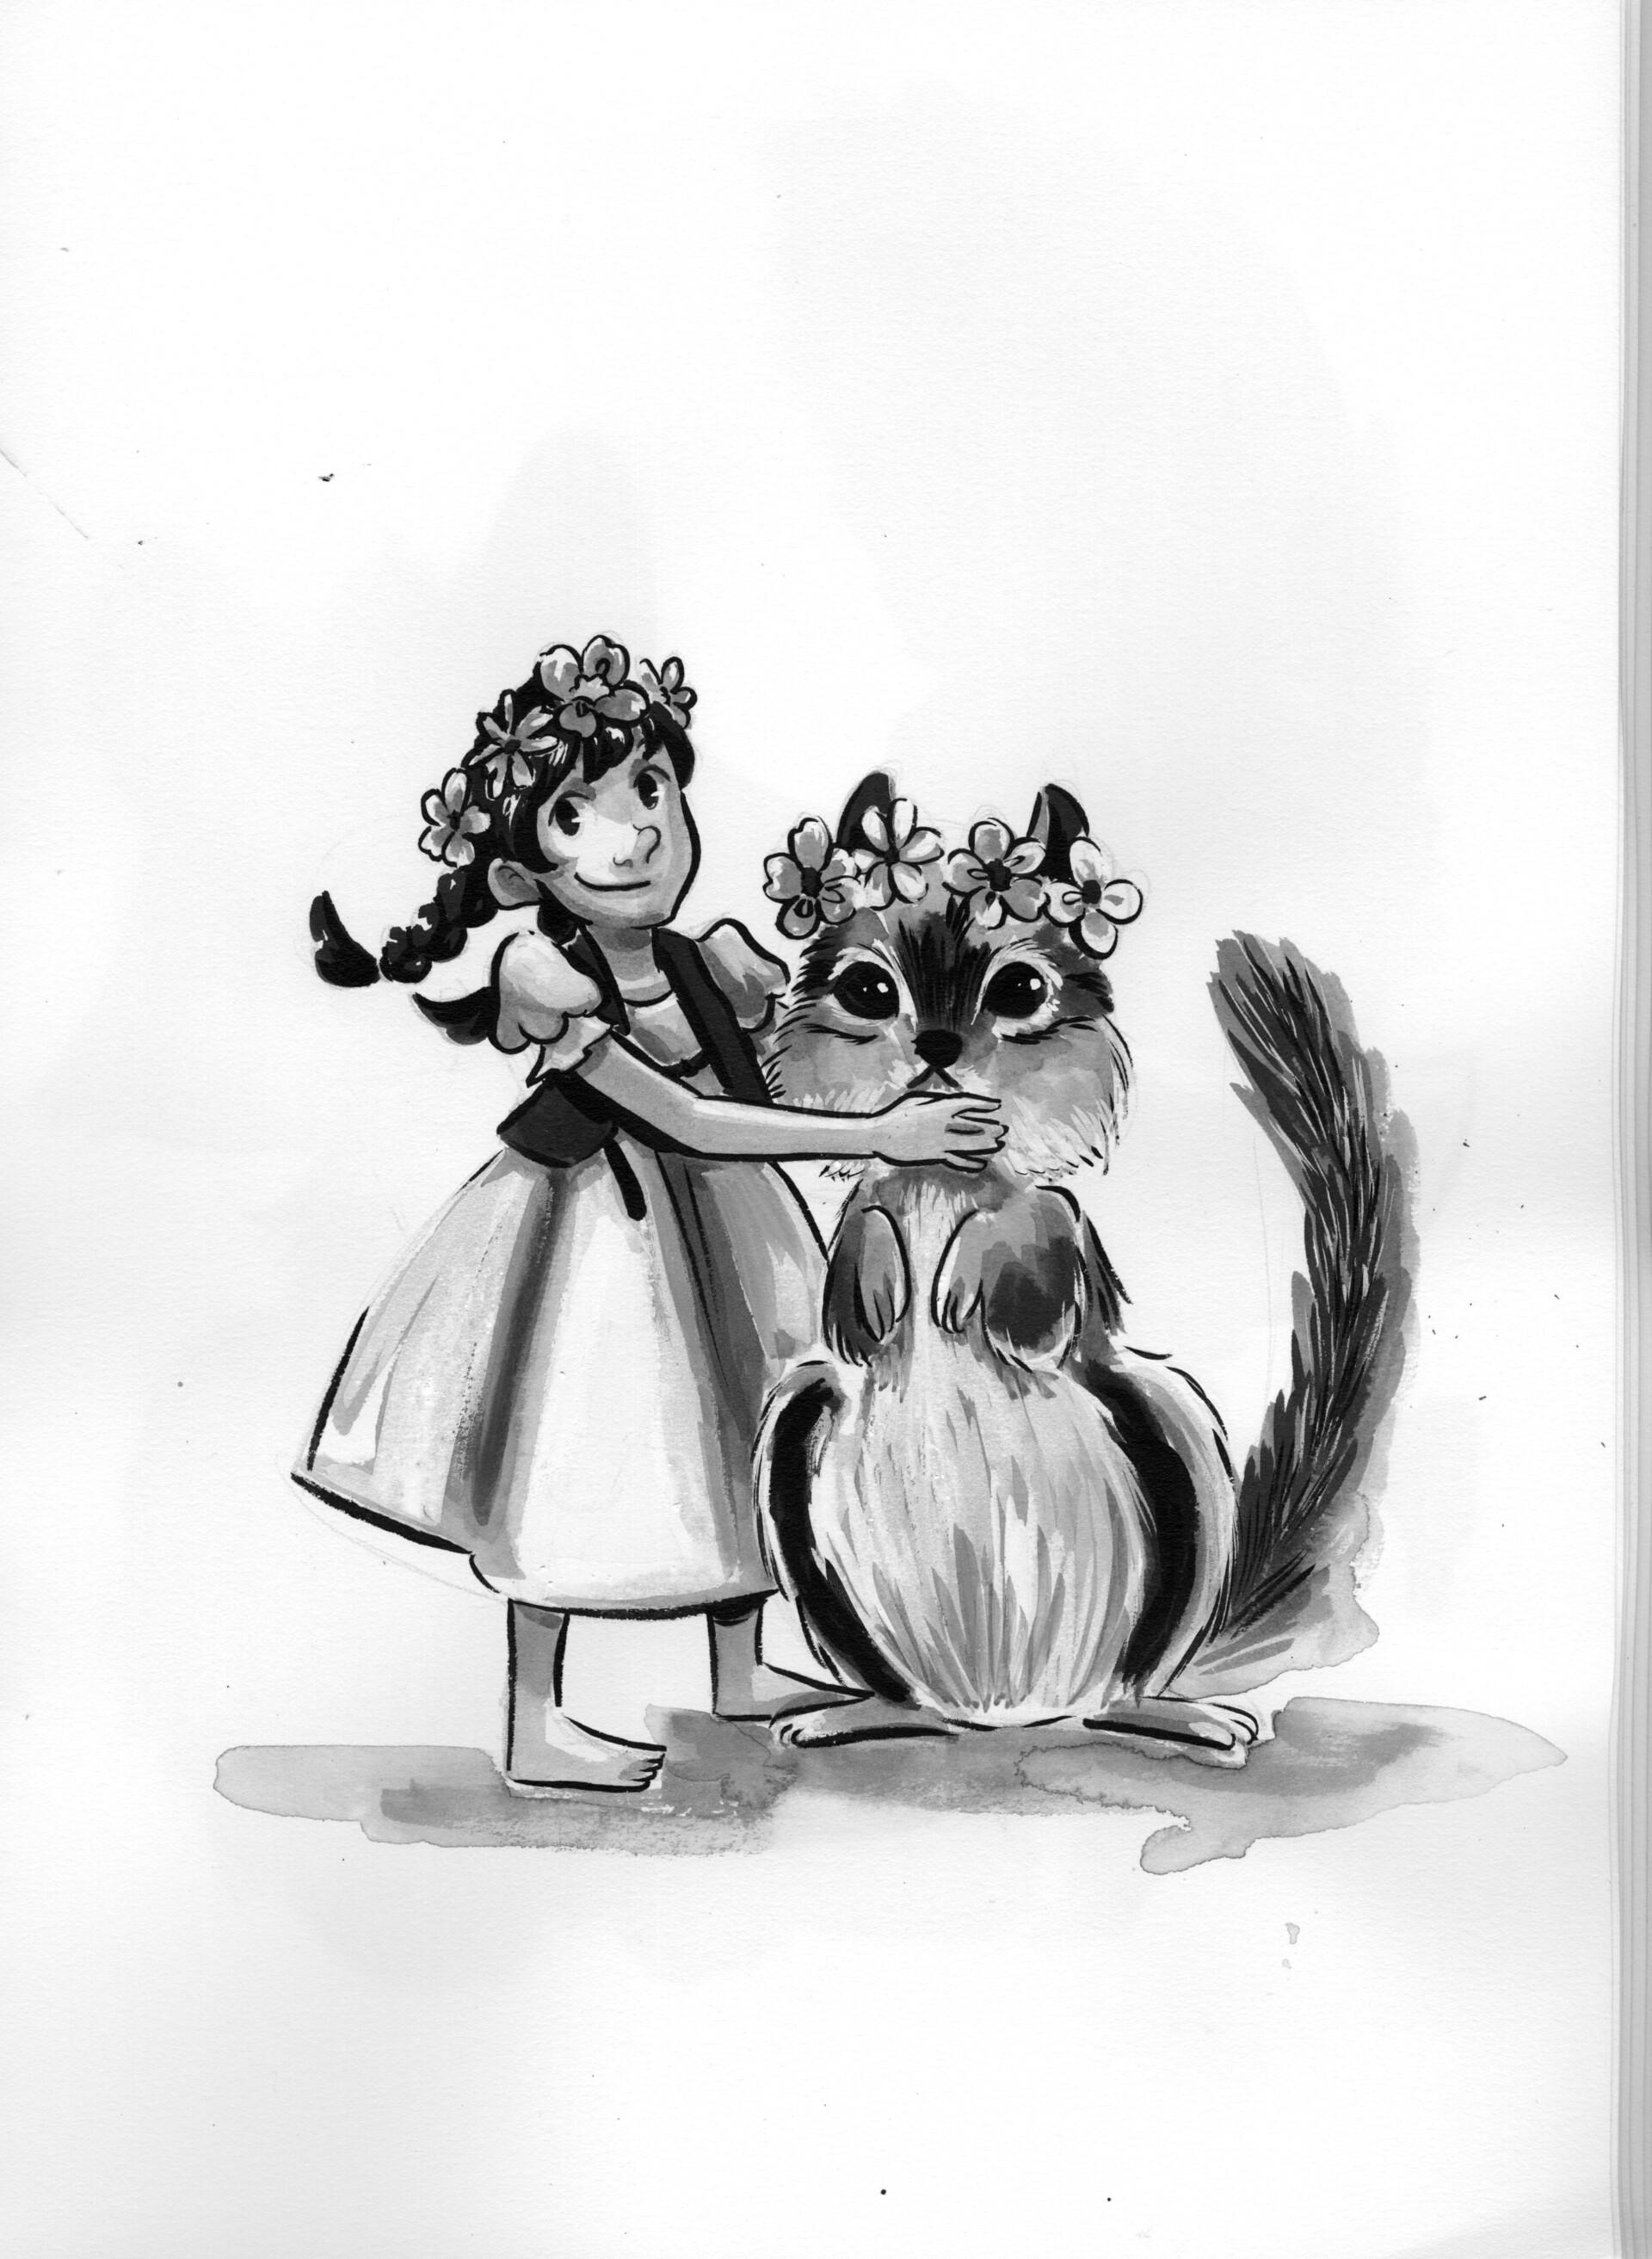 Day 21- Pets- Chipmunk